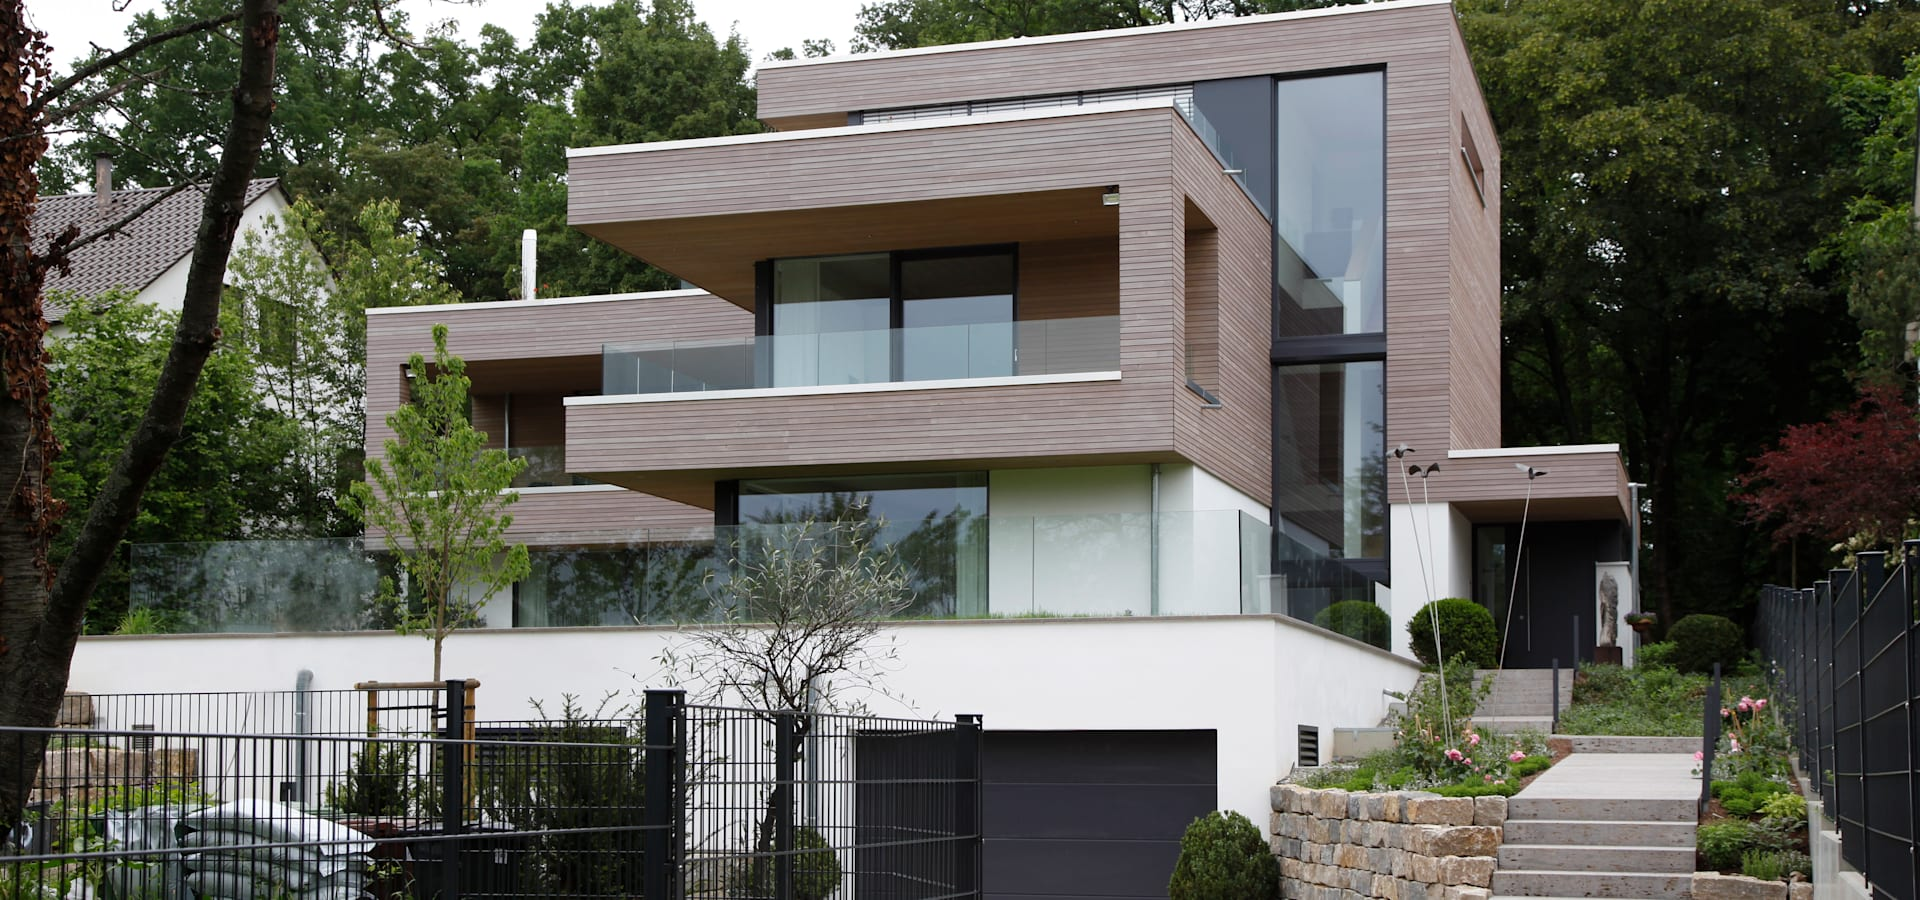 Architekt Ludwigsburg villa in ludwigsburg by birke architekten homify